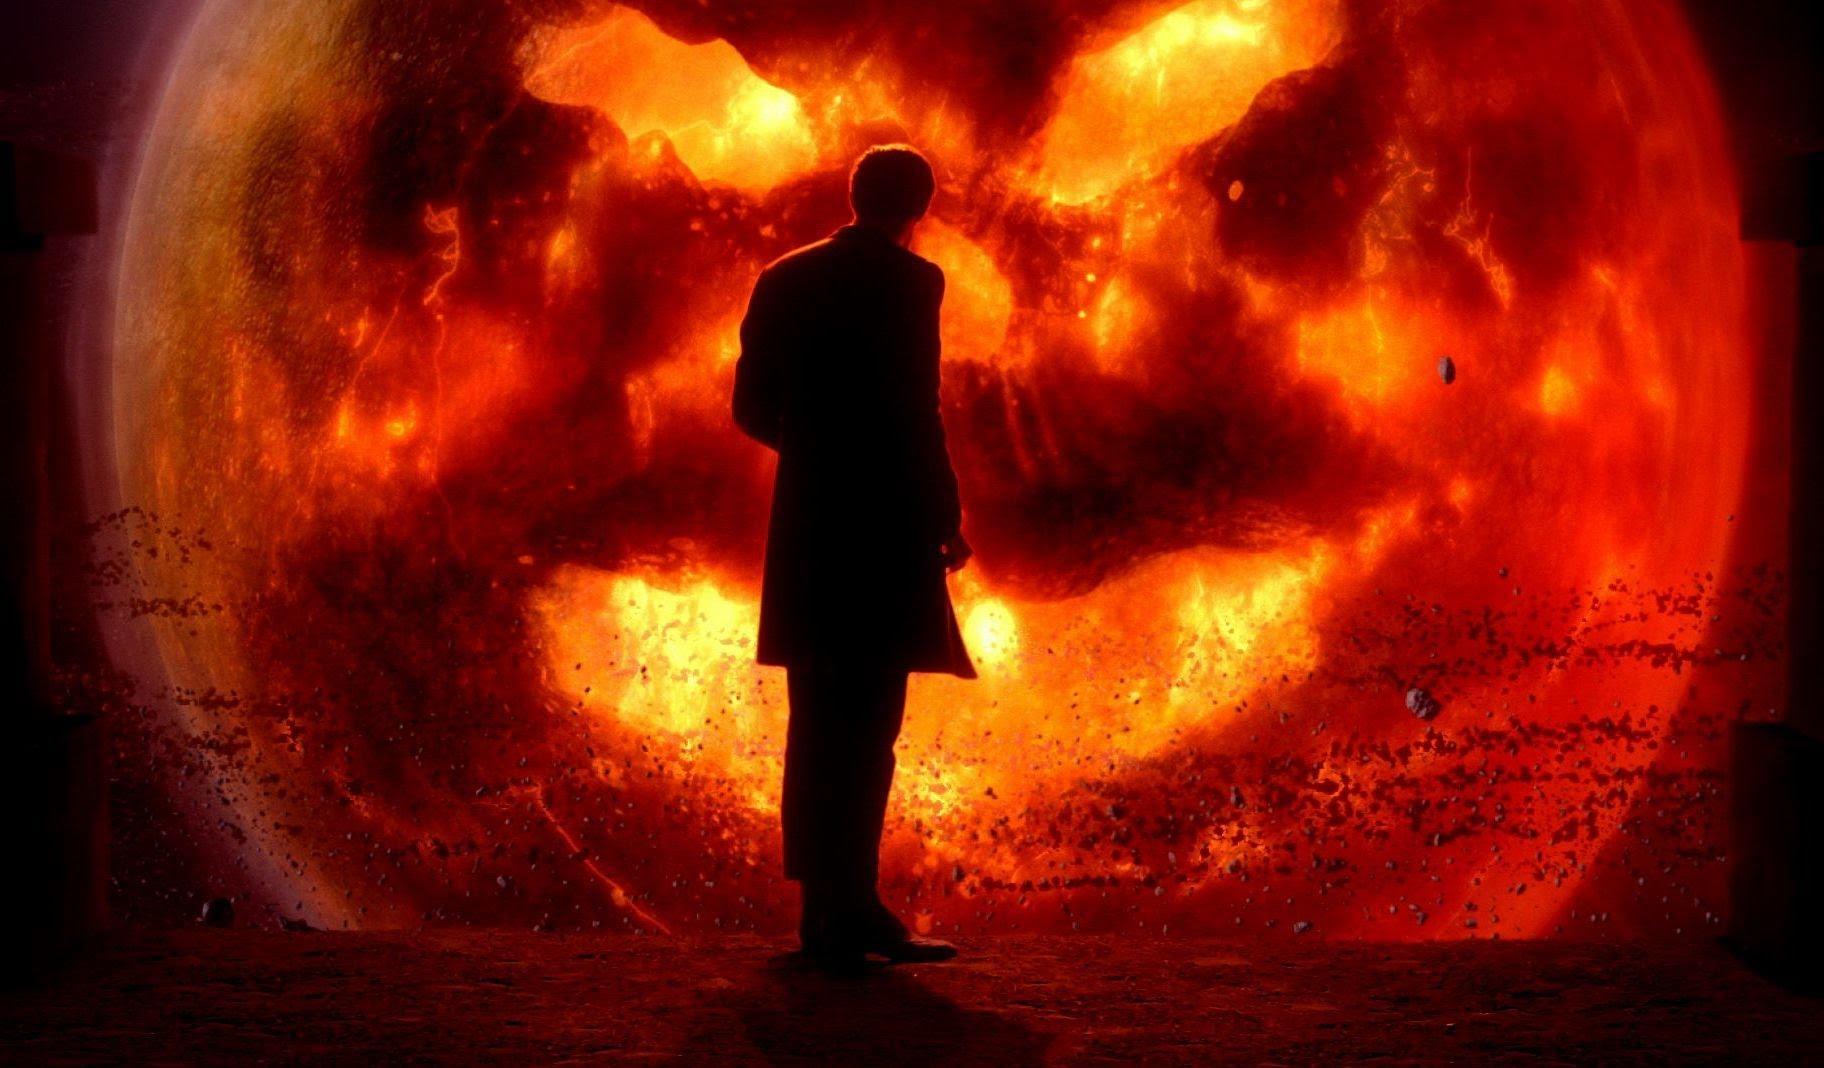 Rings of Akhaten 11th Eleventh Doctor Matt Smith